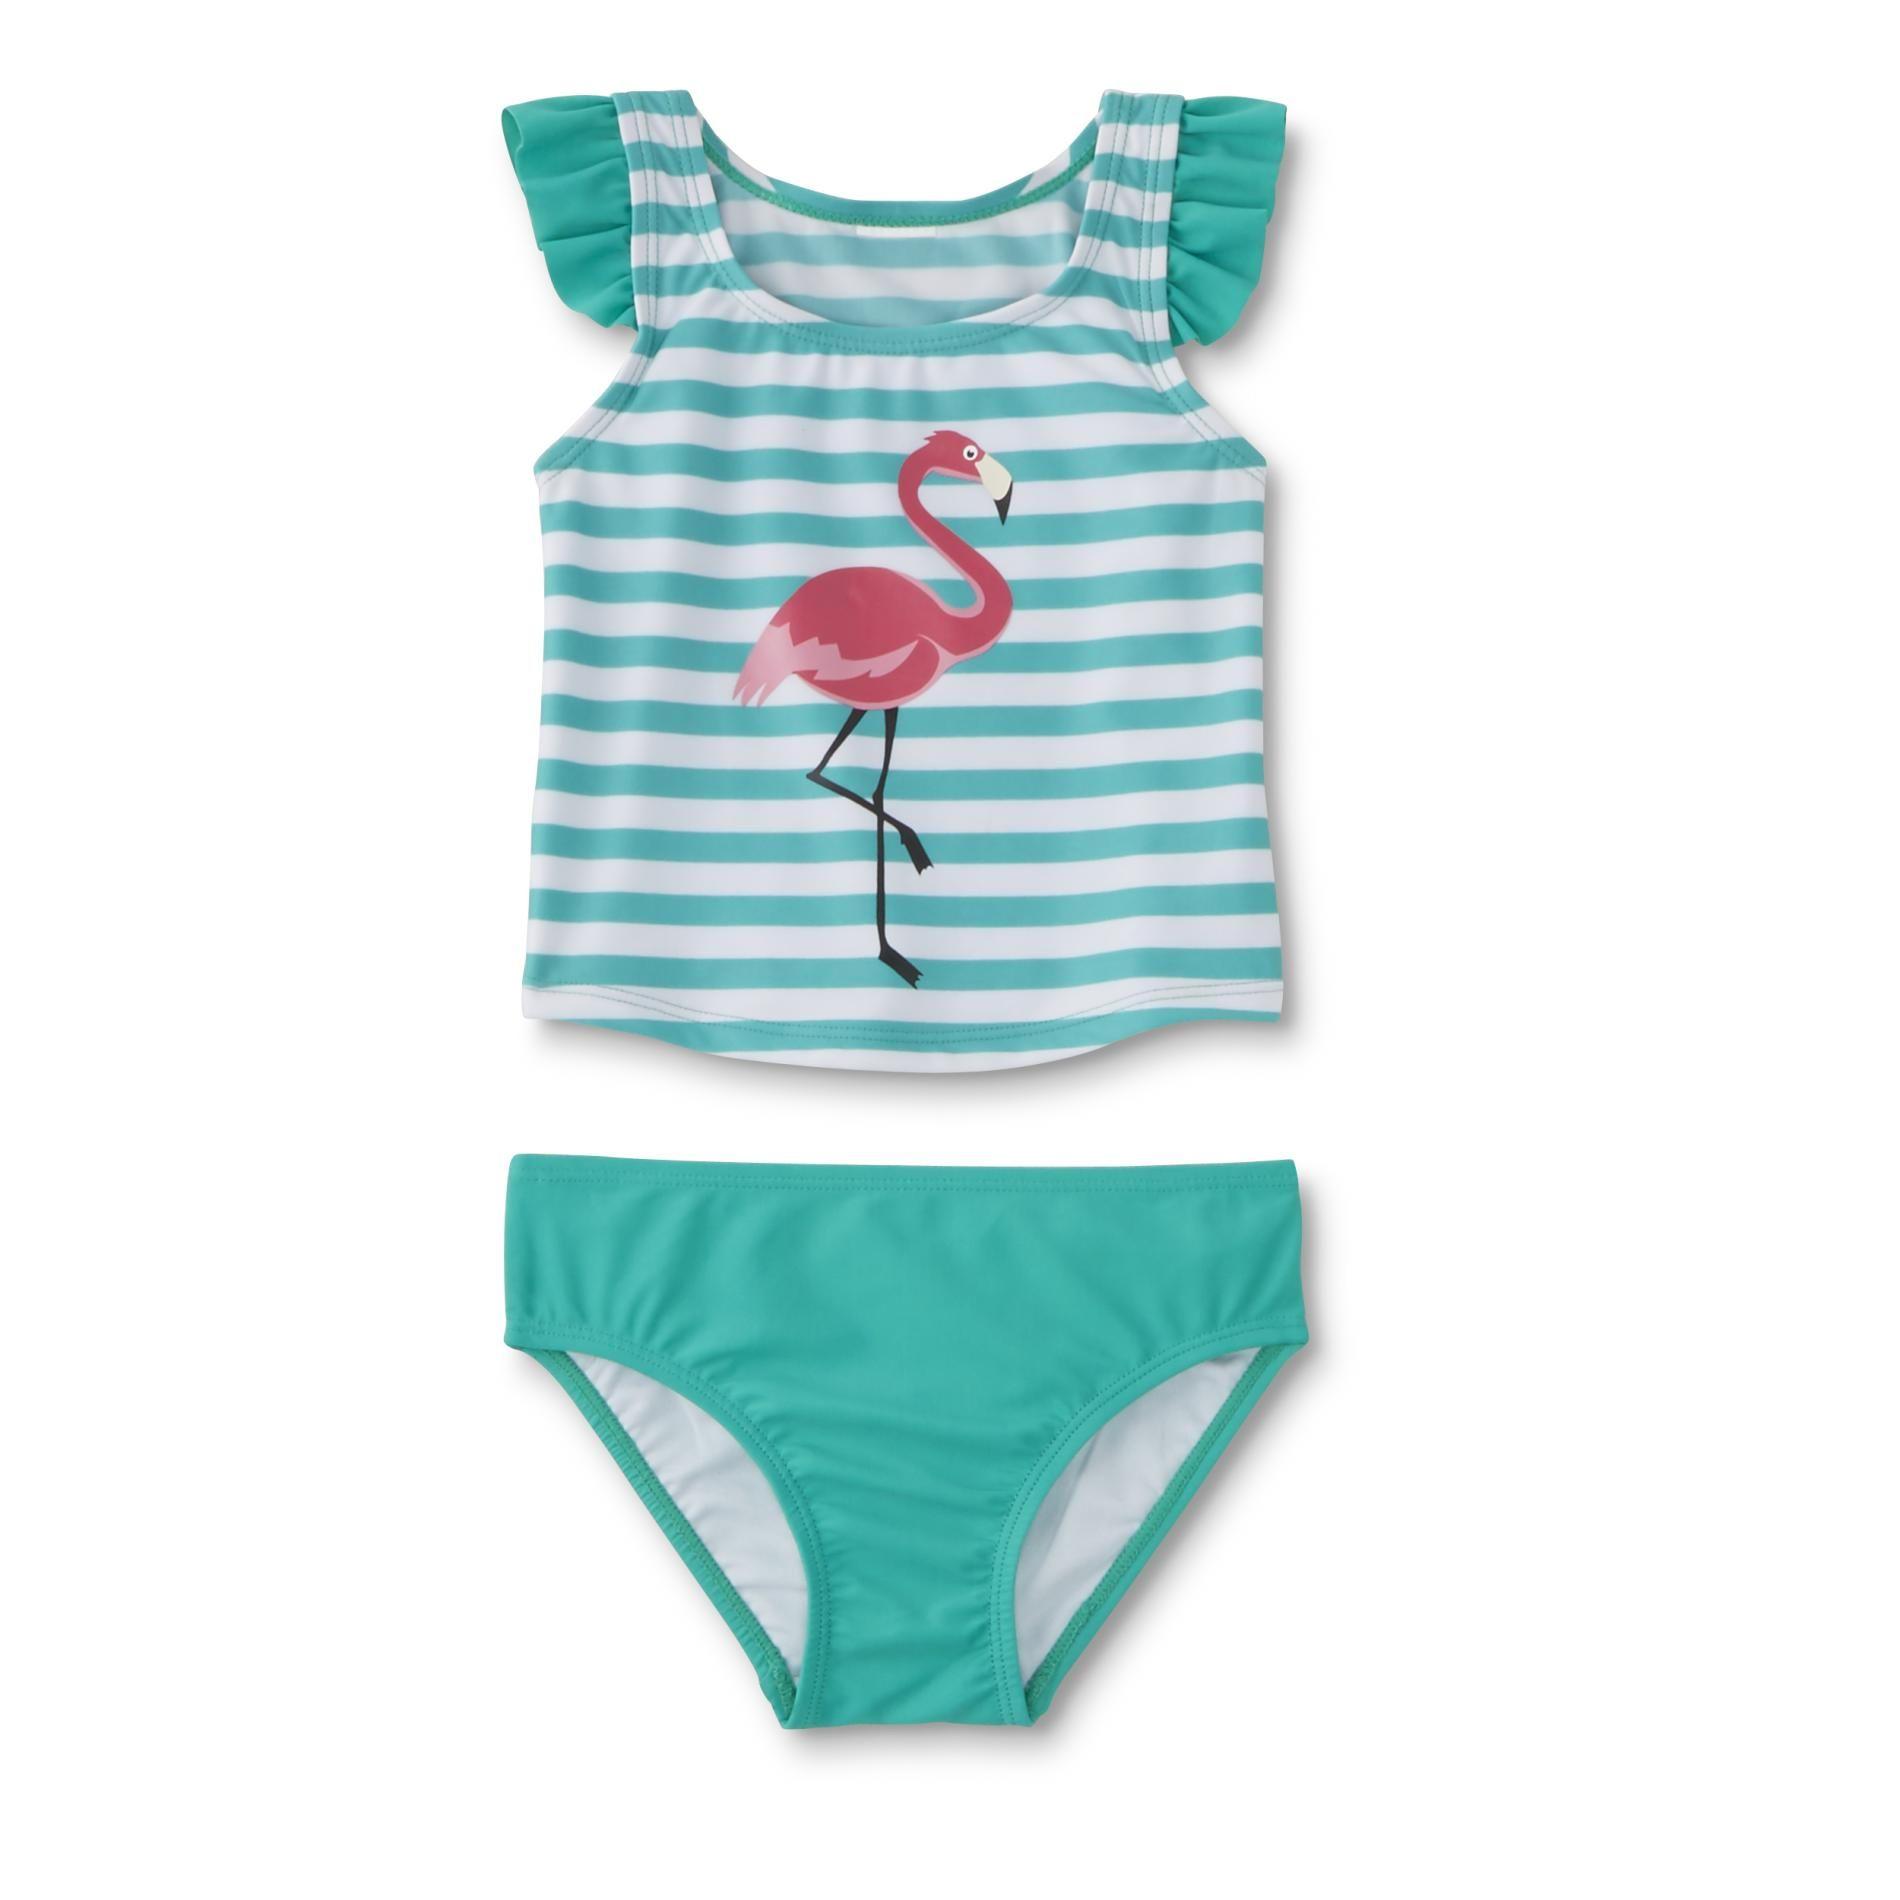 ea45557a80 #Kmart - WonderKids Infant & Toddler Girls' Tankini Swim Top & Bottoms -  Flamingo